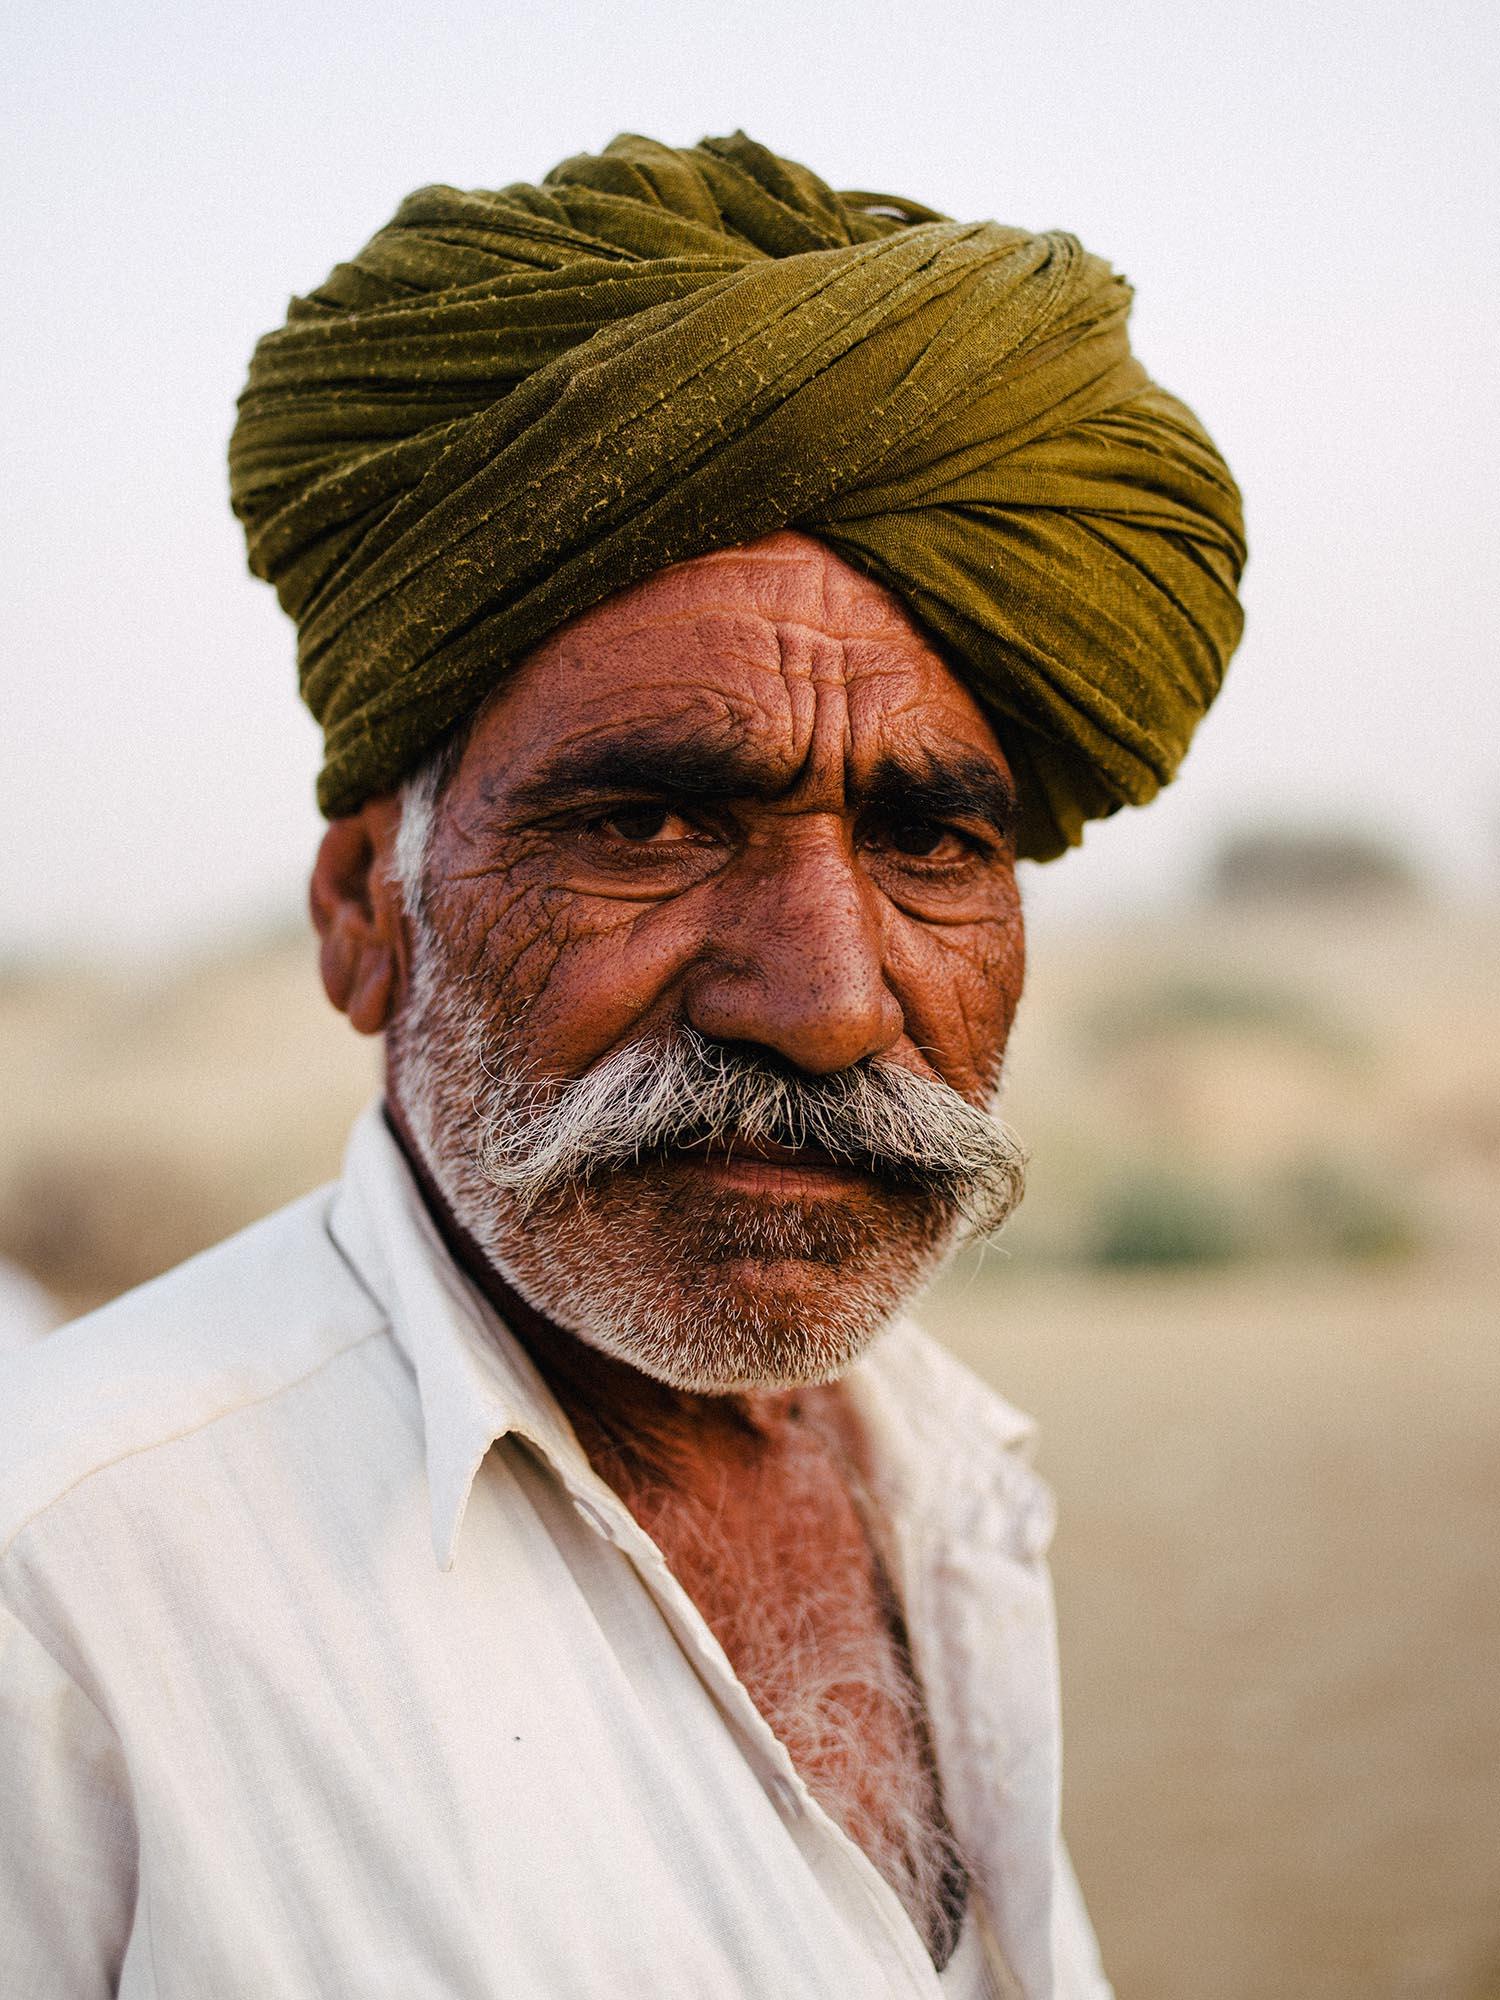 Camel Guide. Jaisalmer, India.